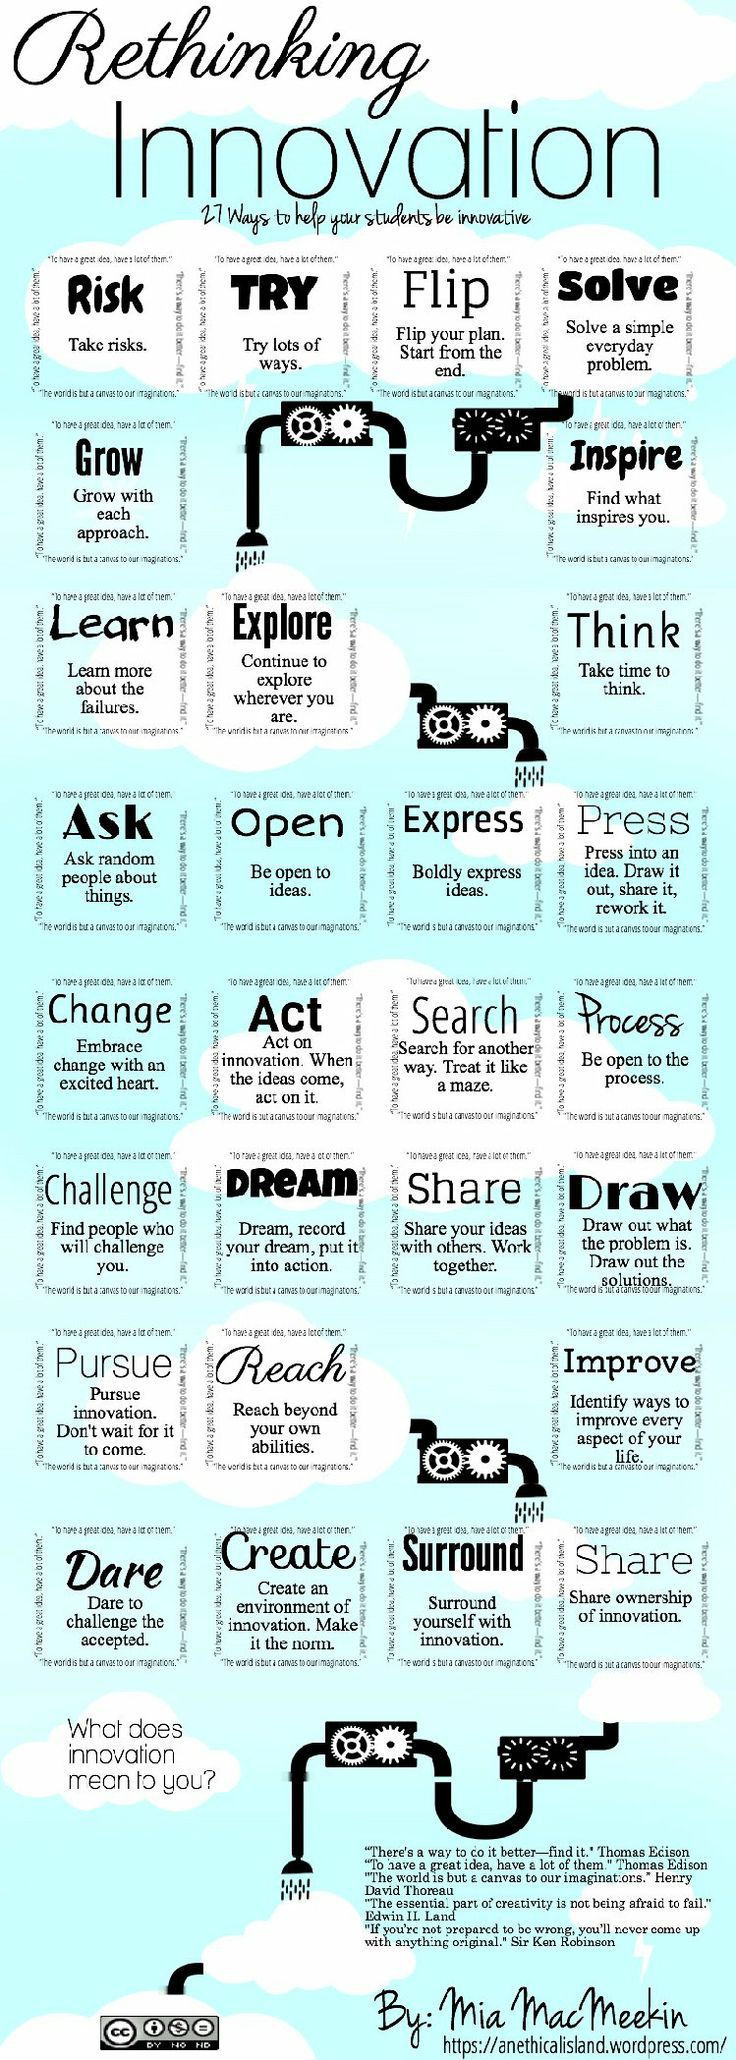 ways-to-inspire-innovation-thinking